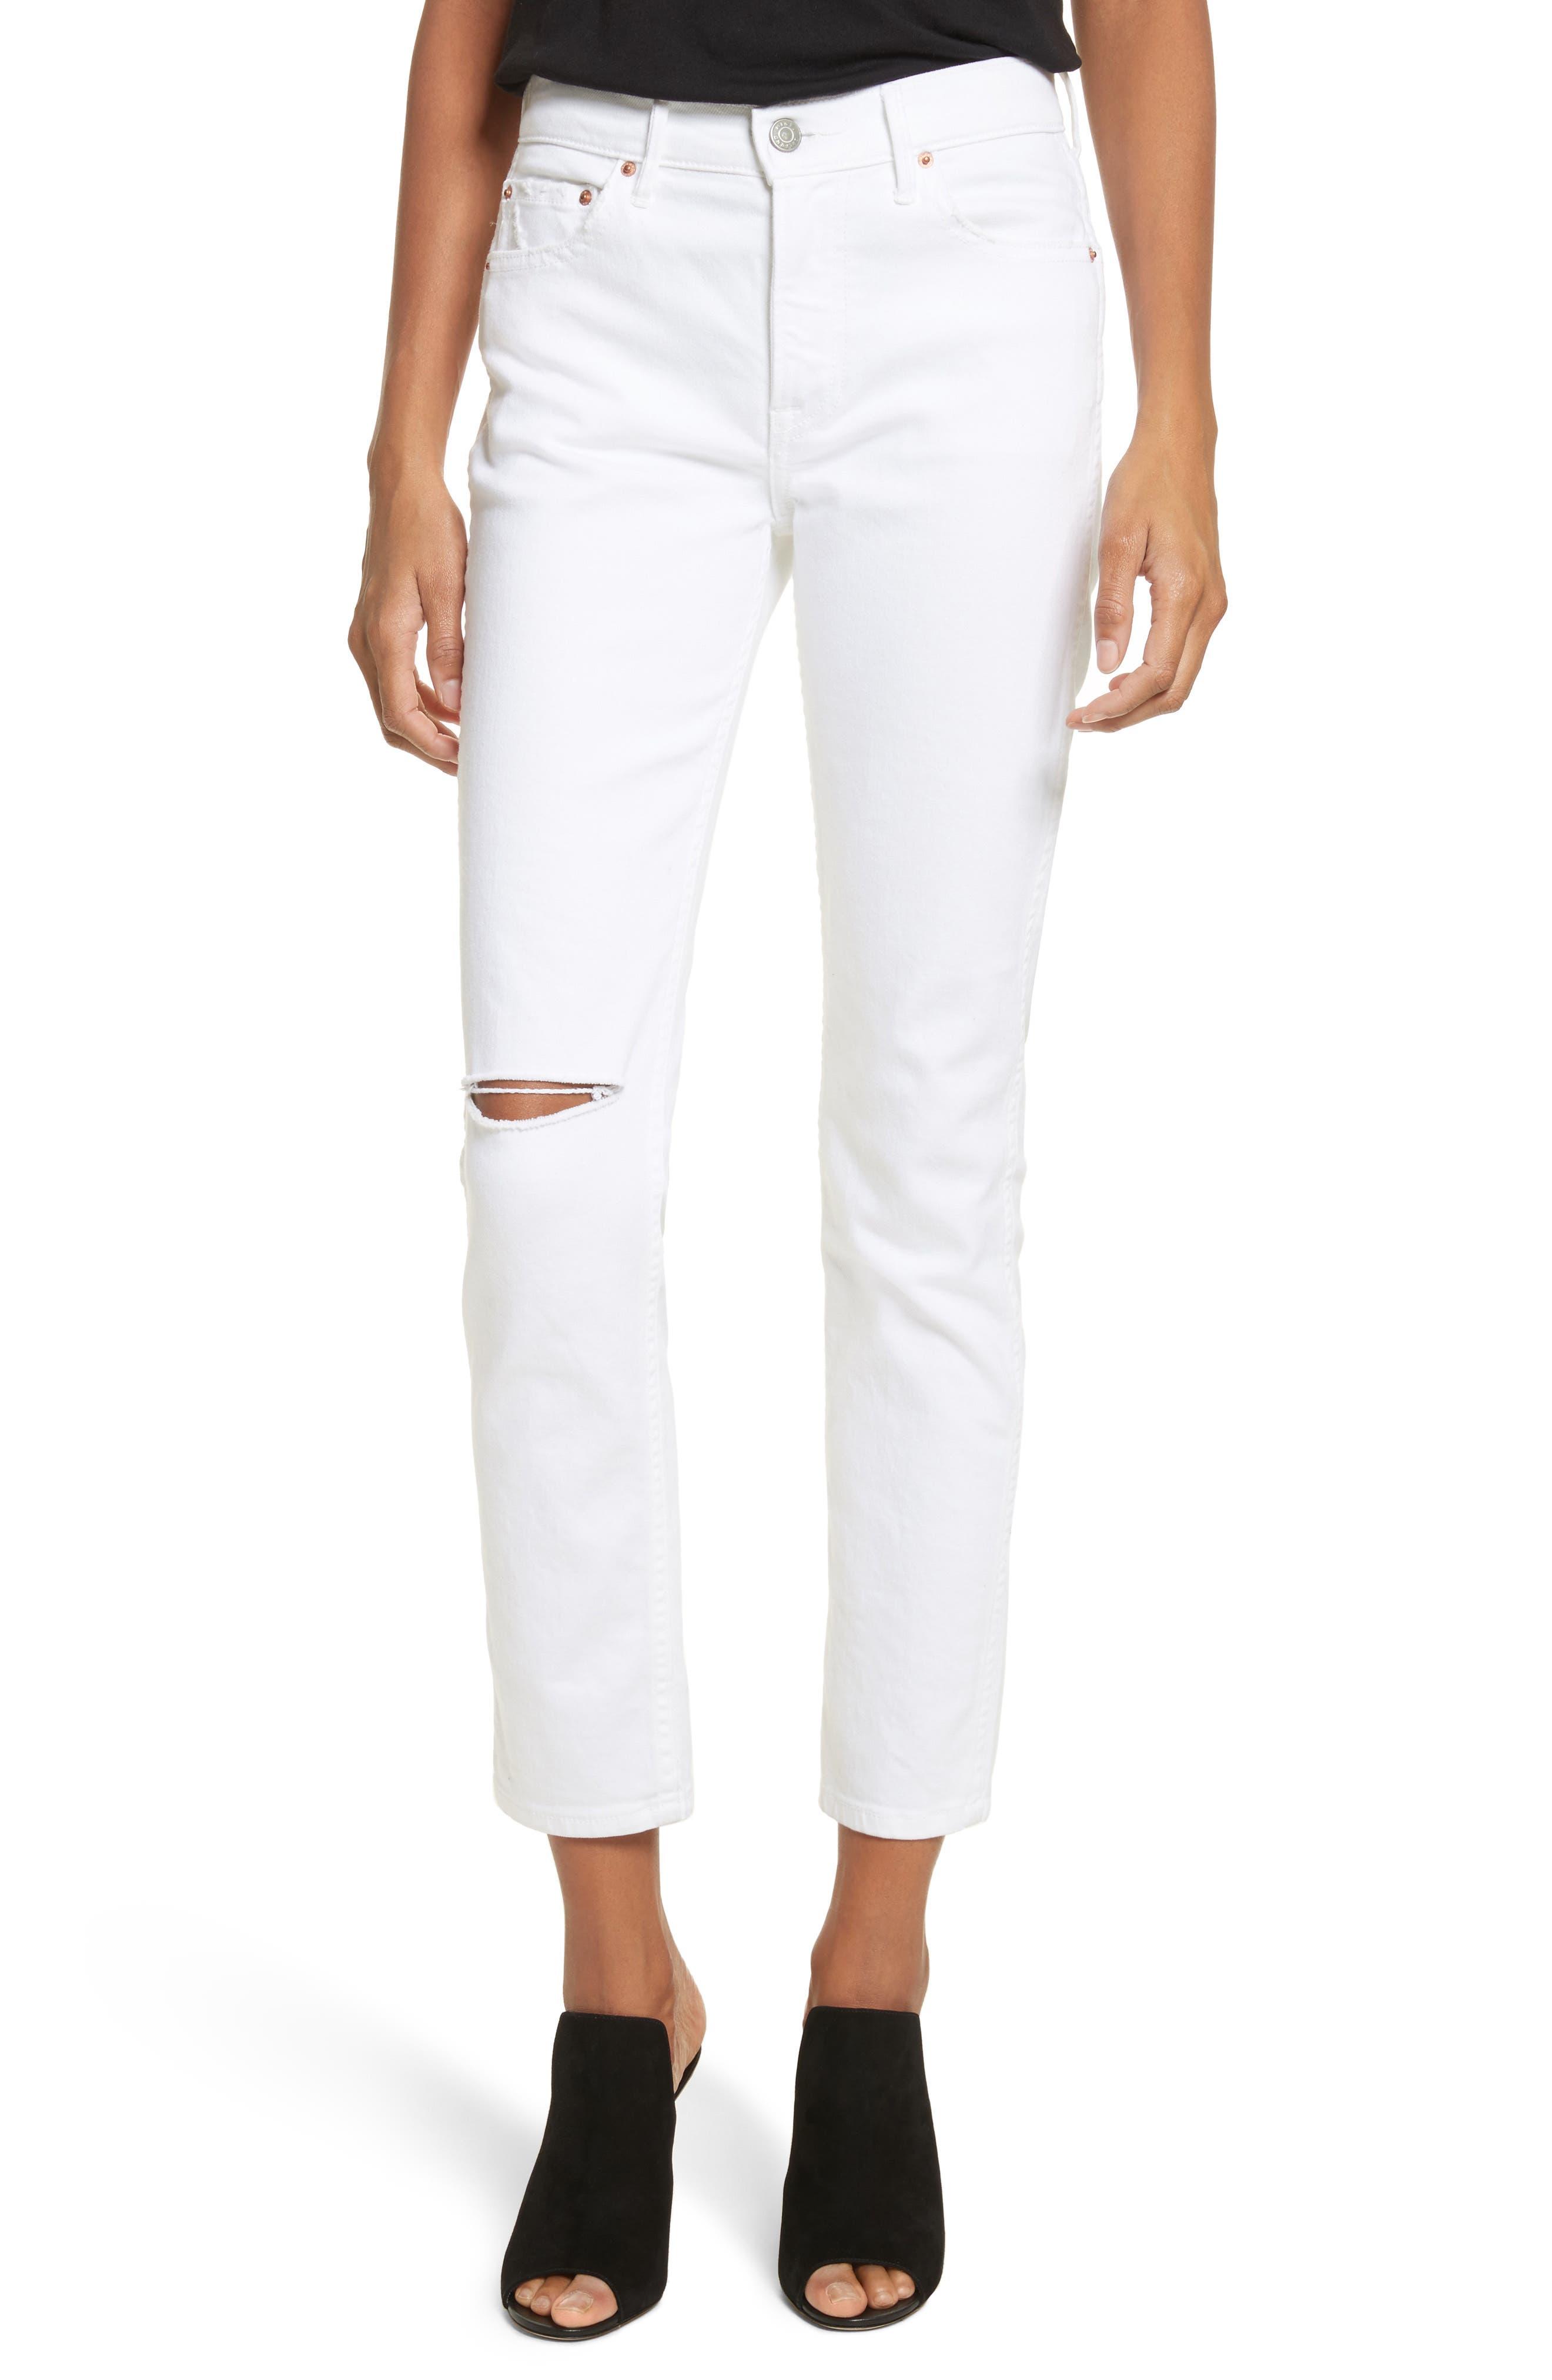 Alternate Image 1 Selected - GRLFRND Naomi High Waist Skinny Jeans (Florence)